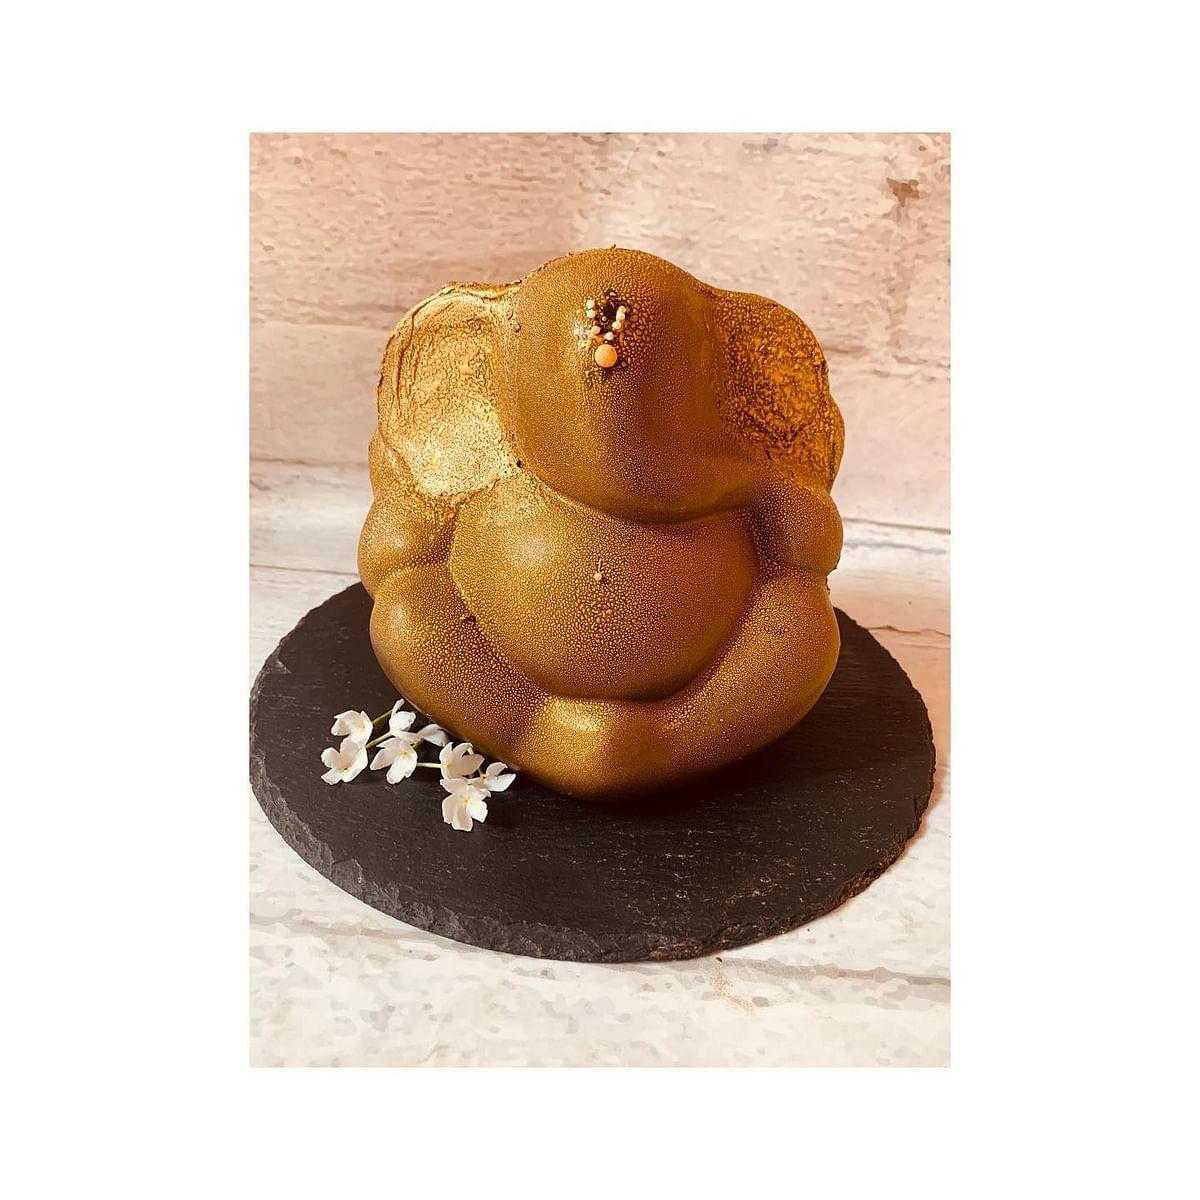 Simple chocolate Ganesh